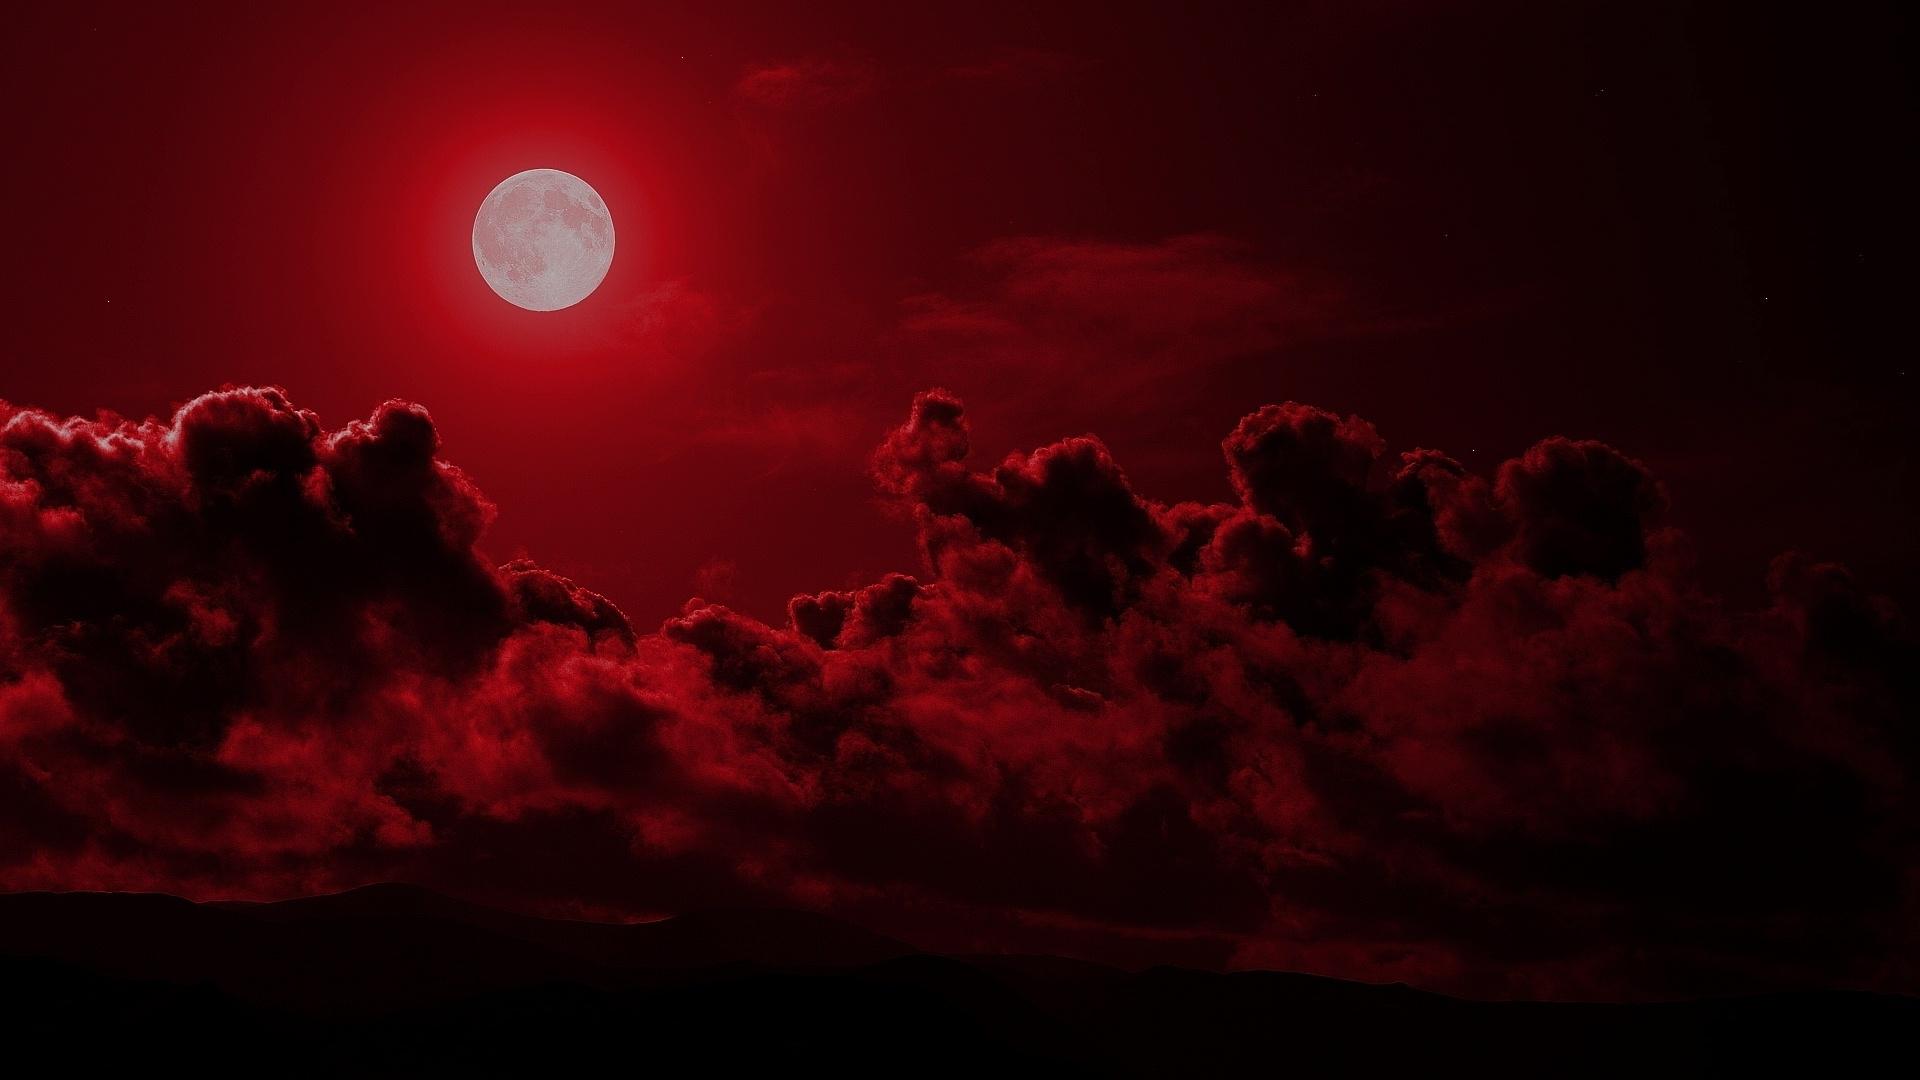 red moon wallpaper hd | pixelstalk